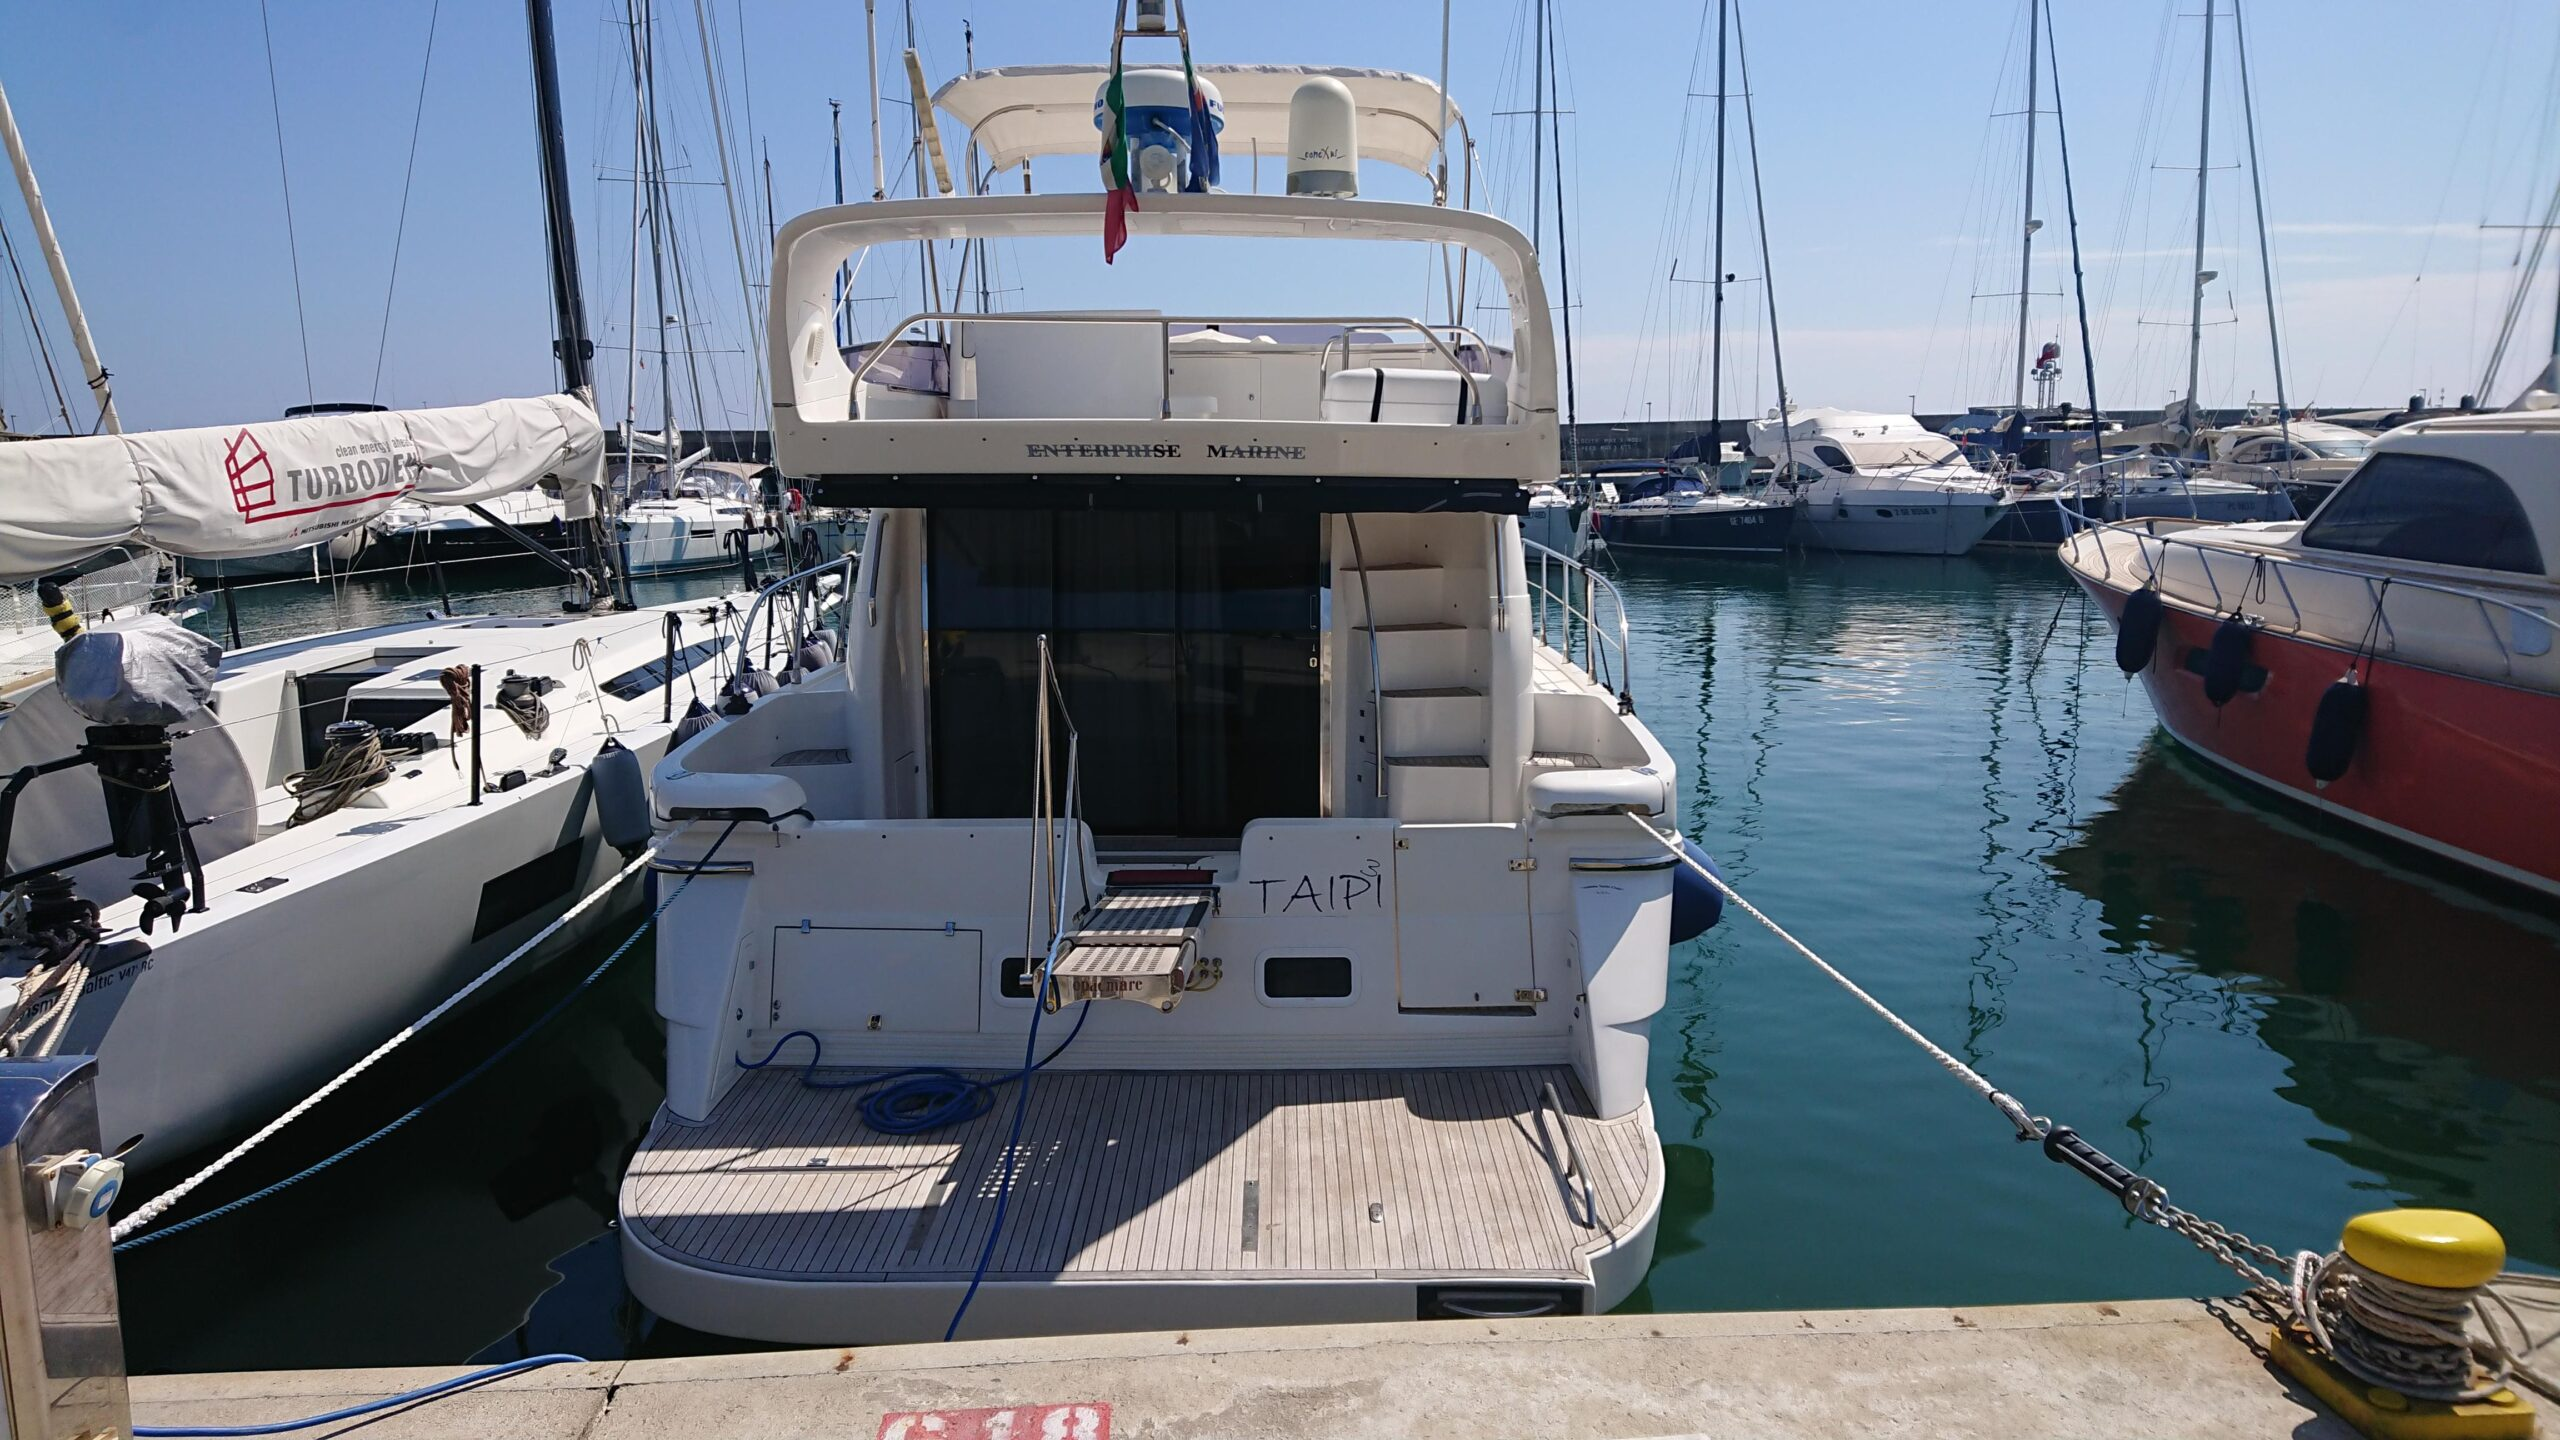 Meilentörns Motorboot Aussen 3